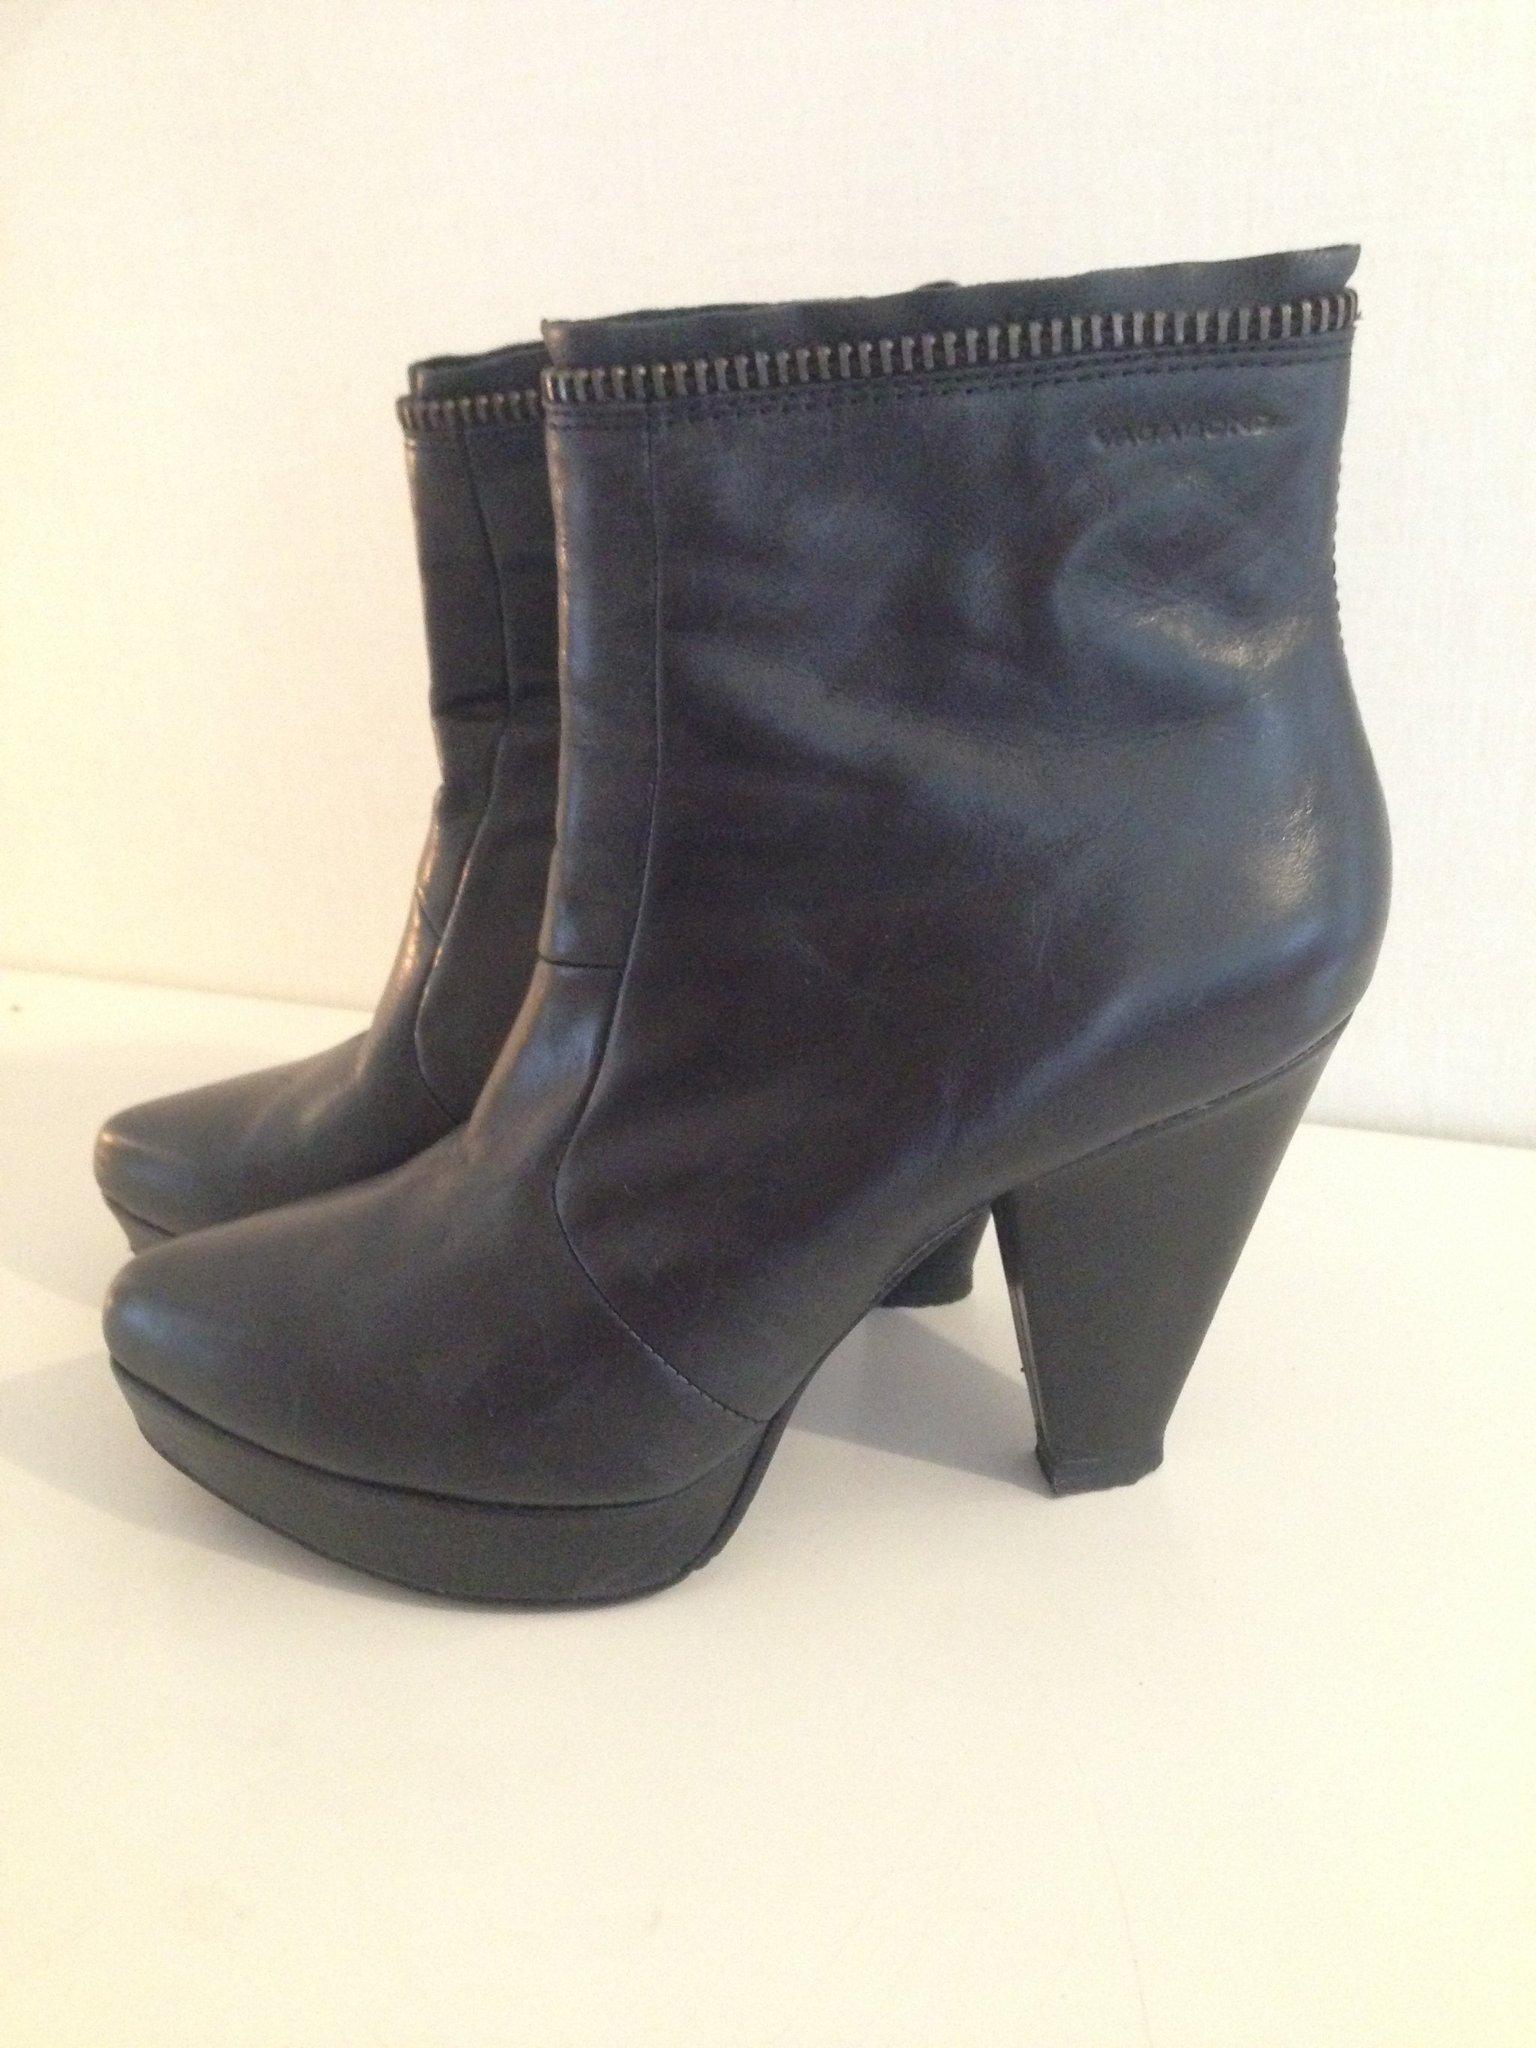 Snygga BootsHigh heels i Svart Skinn, storlek .. (402391165